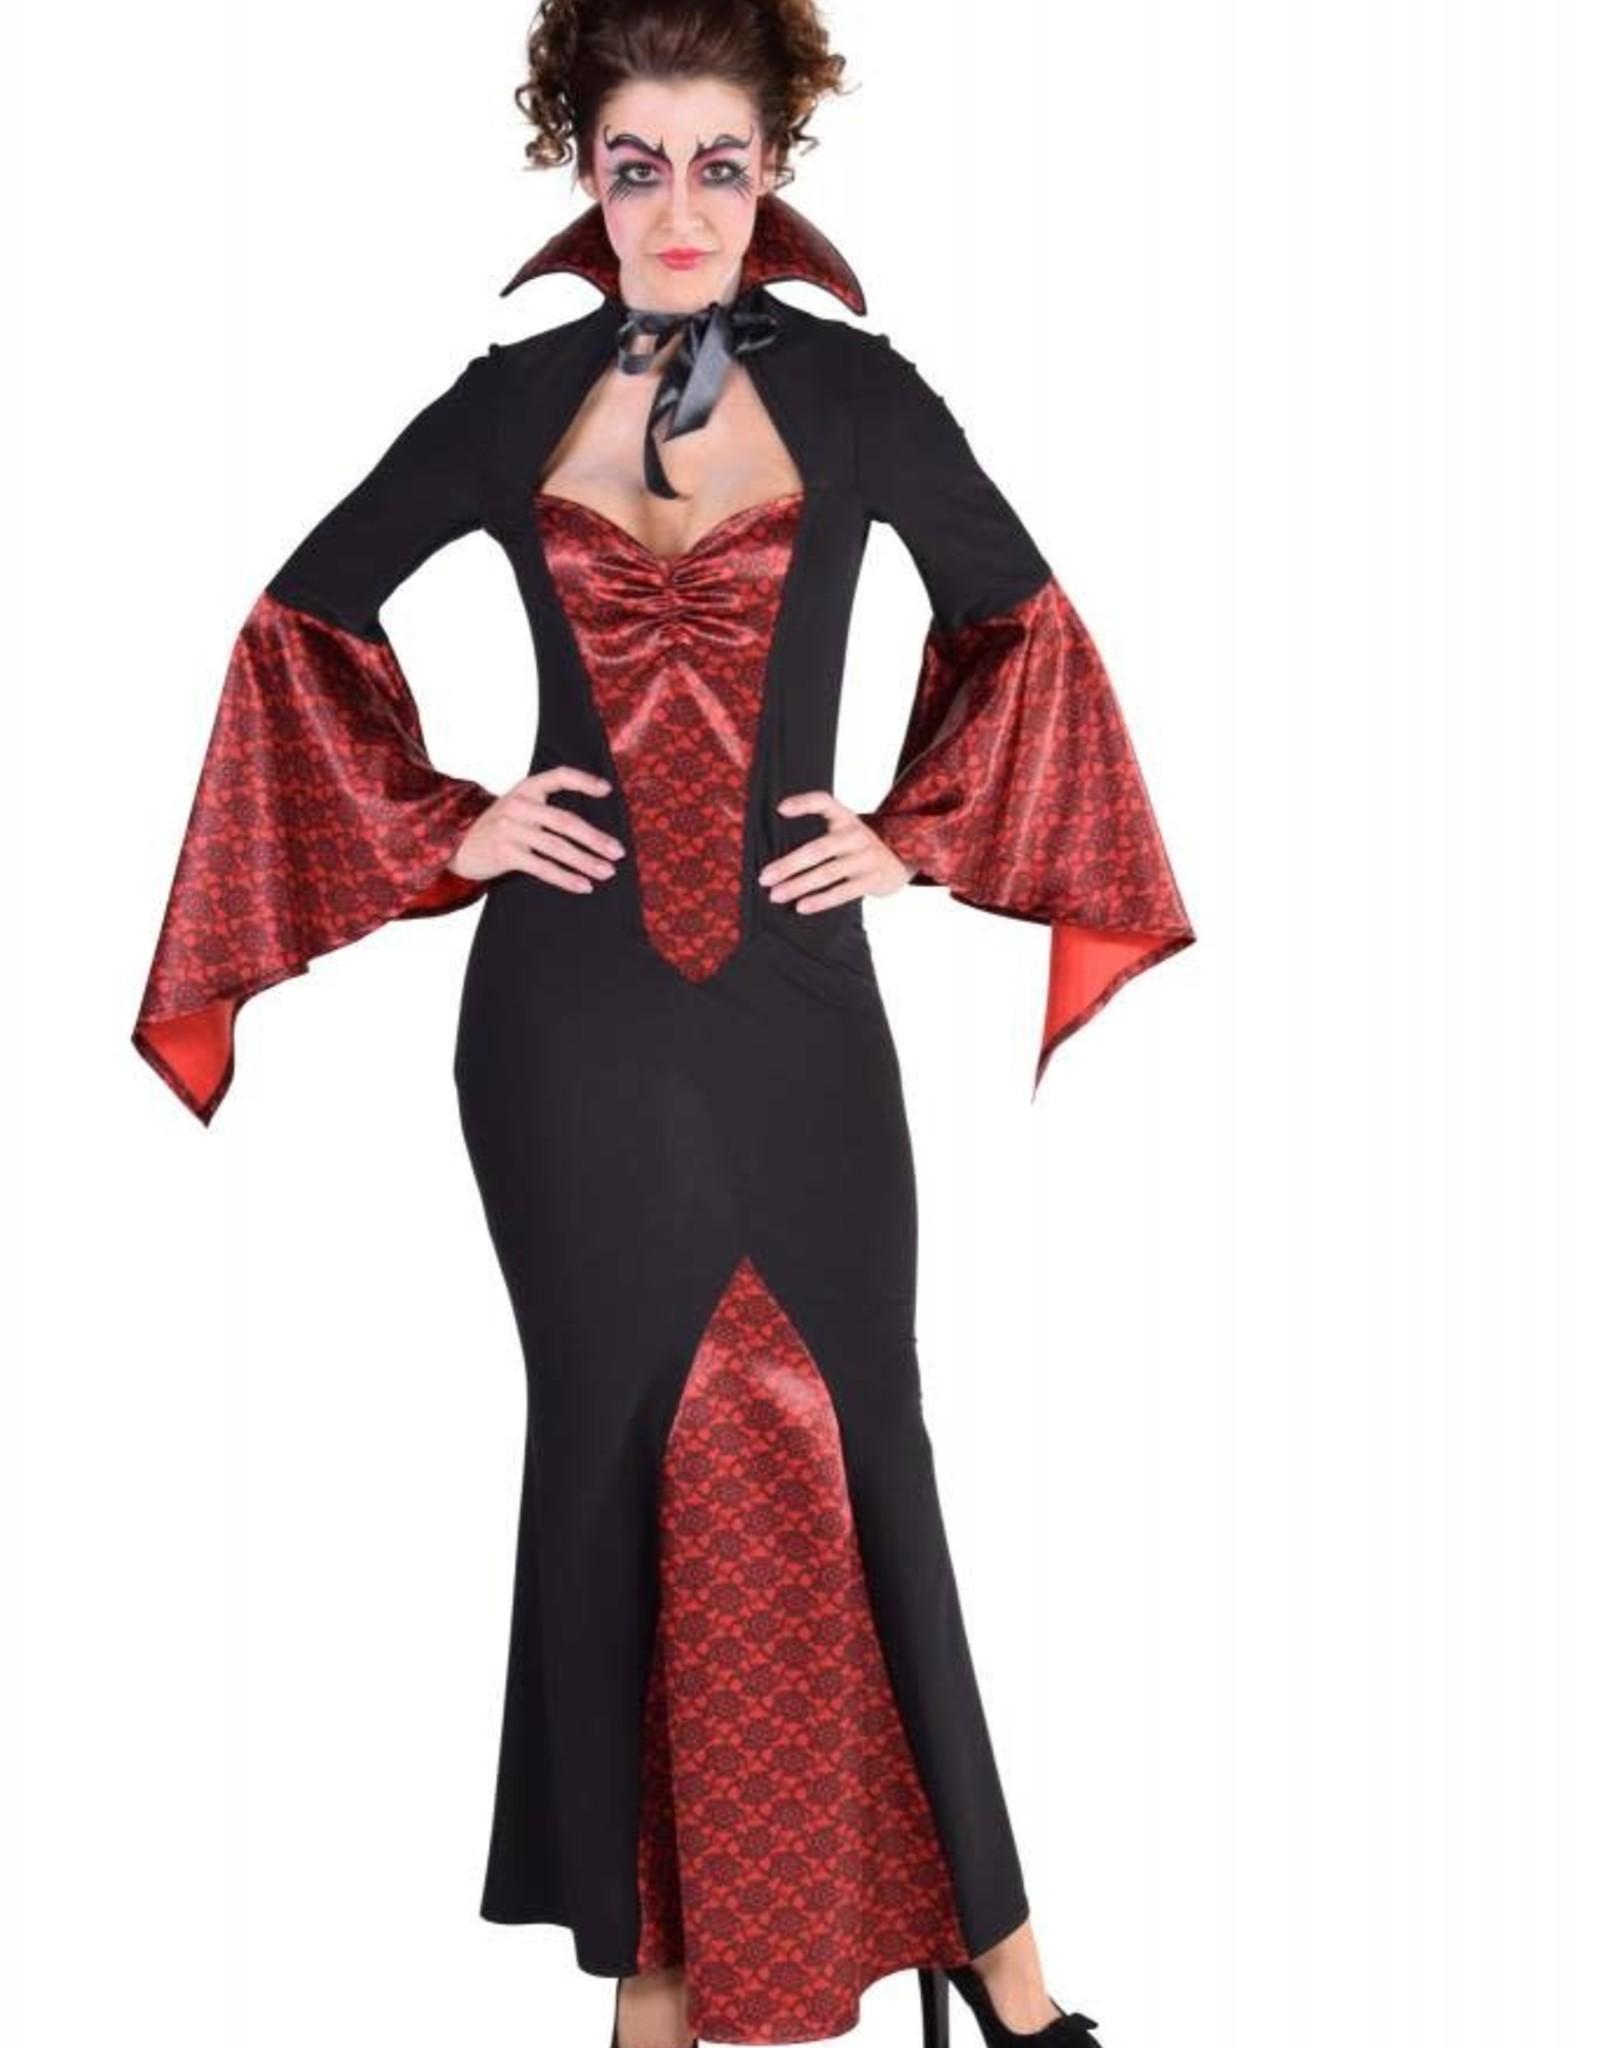 MAGIC Vampier dame huurprijs € 20